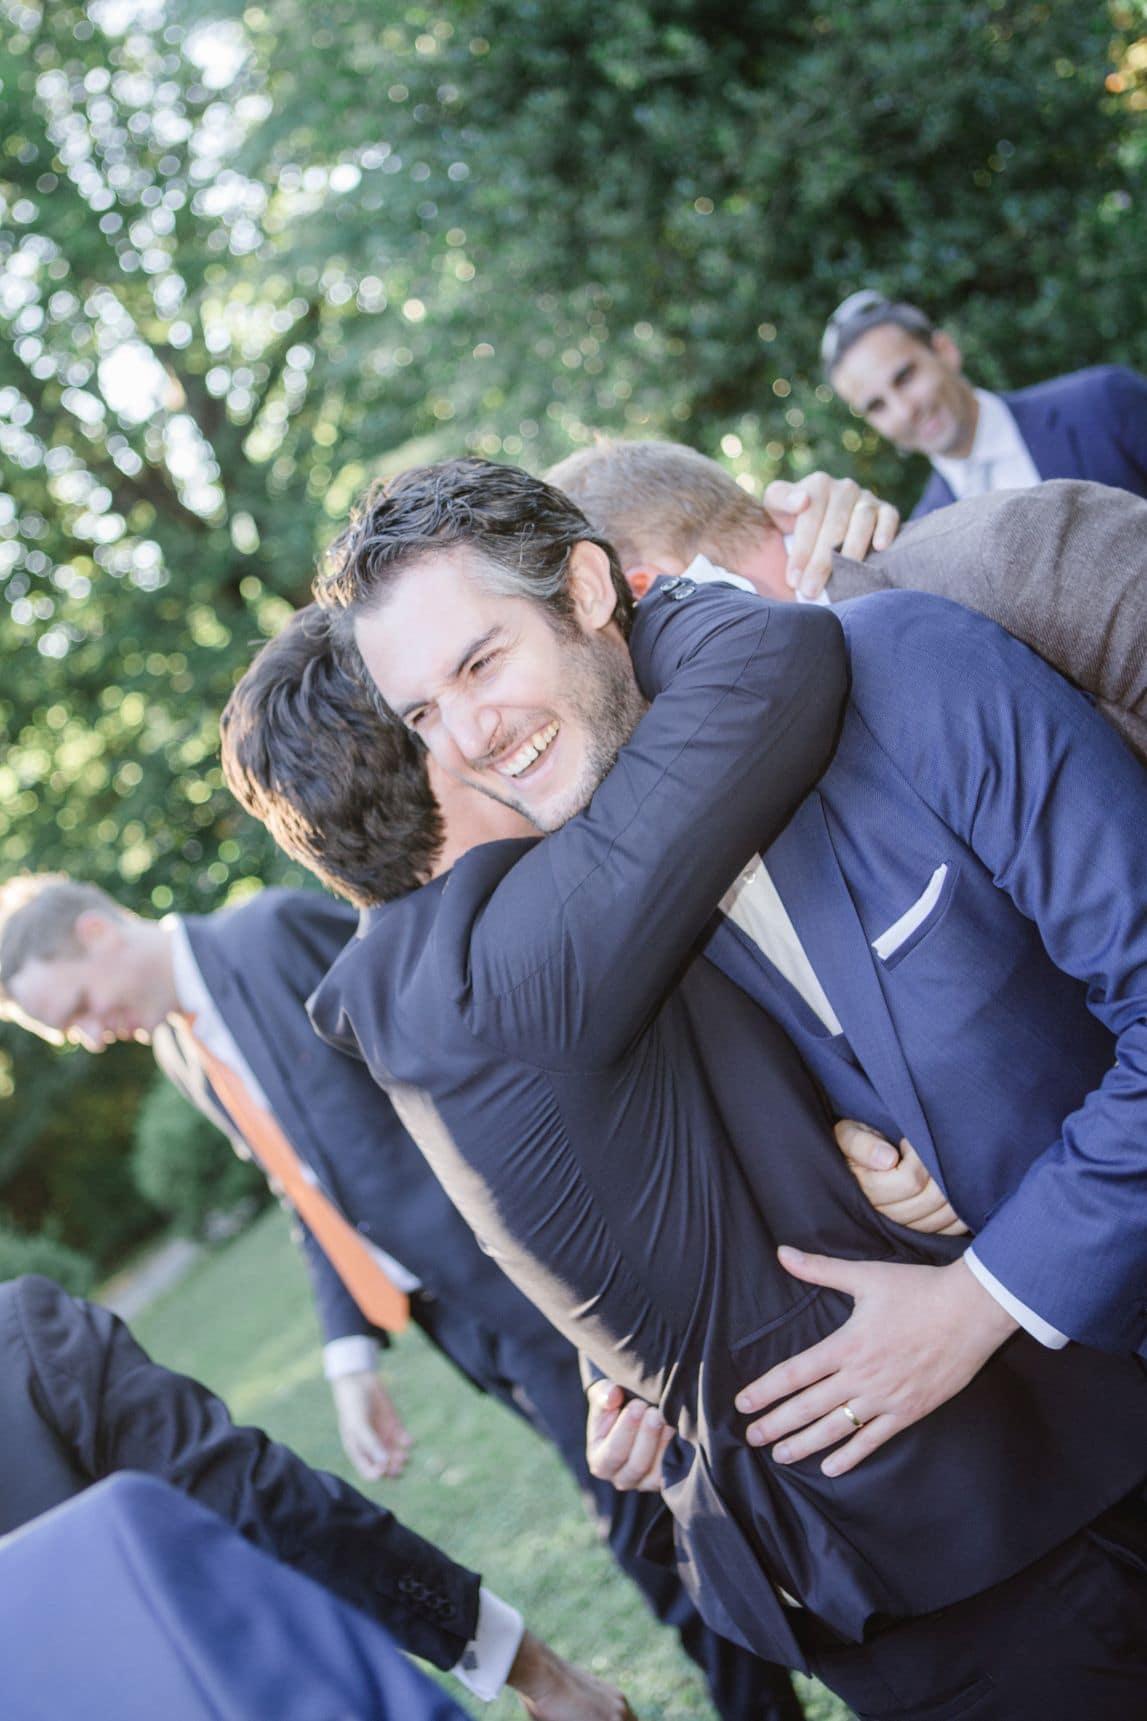 Million Memories_A&D_Hochzeitsfotograf_Schlosshochzeit_Toskana_Lago Di Como_Wedding_Tuscany_160